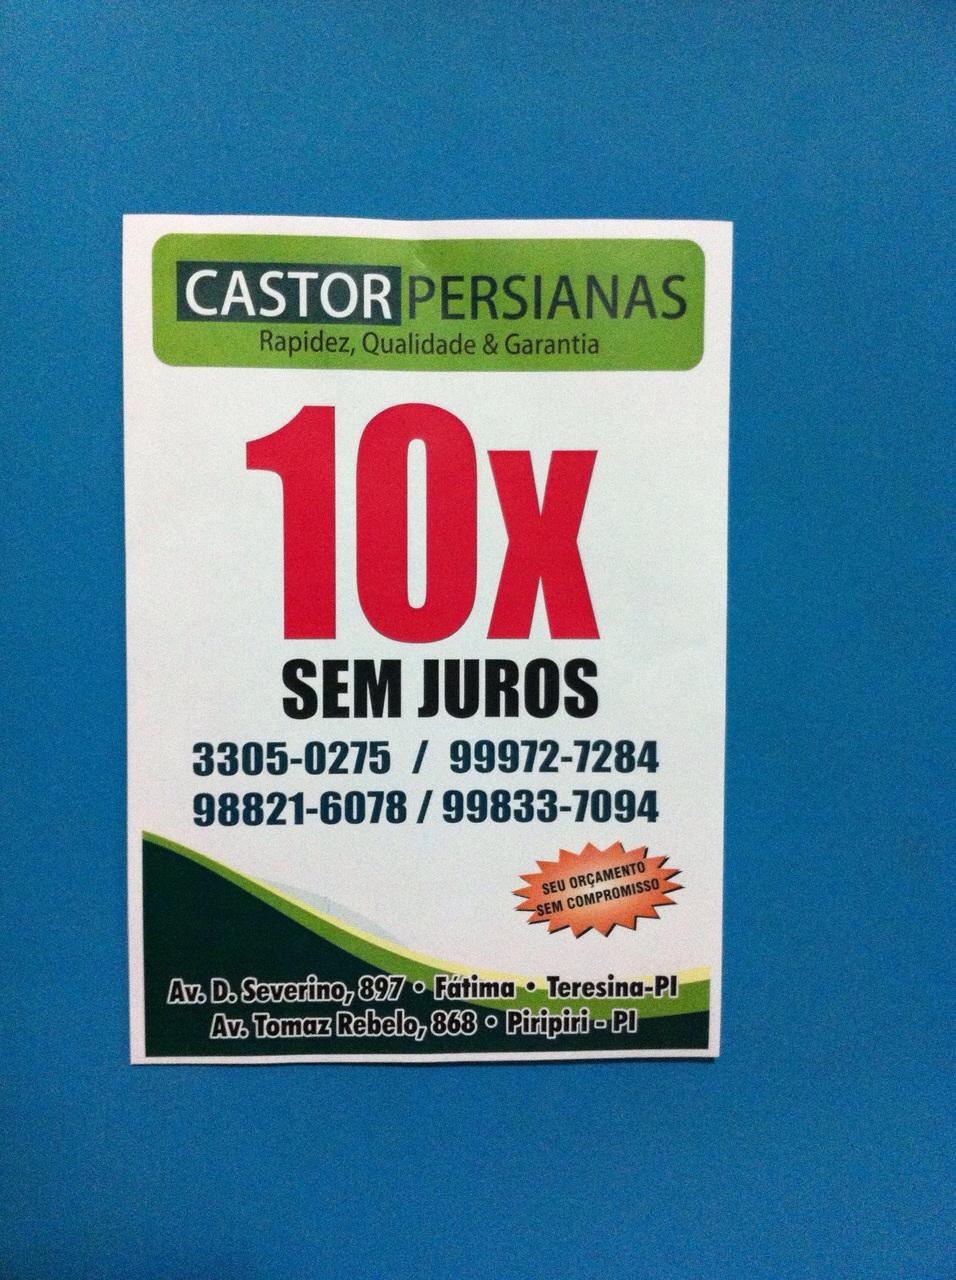 CASTOR Persianas2